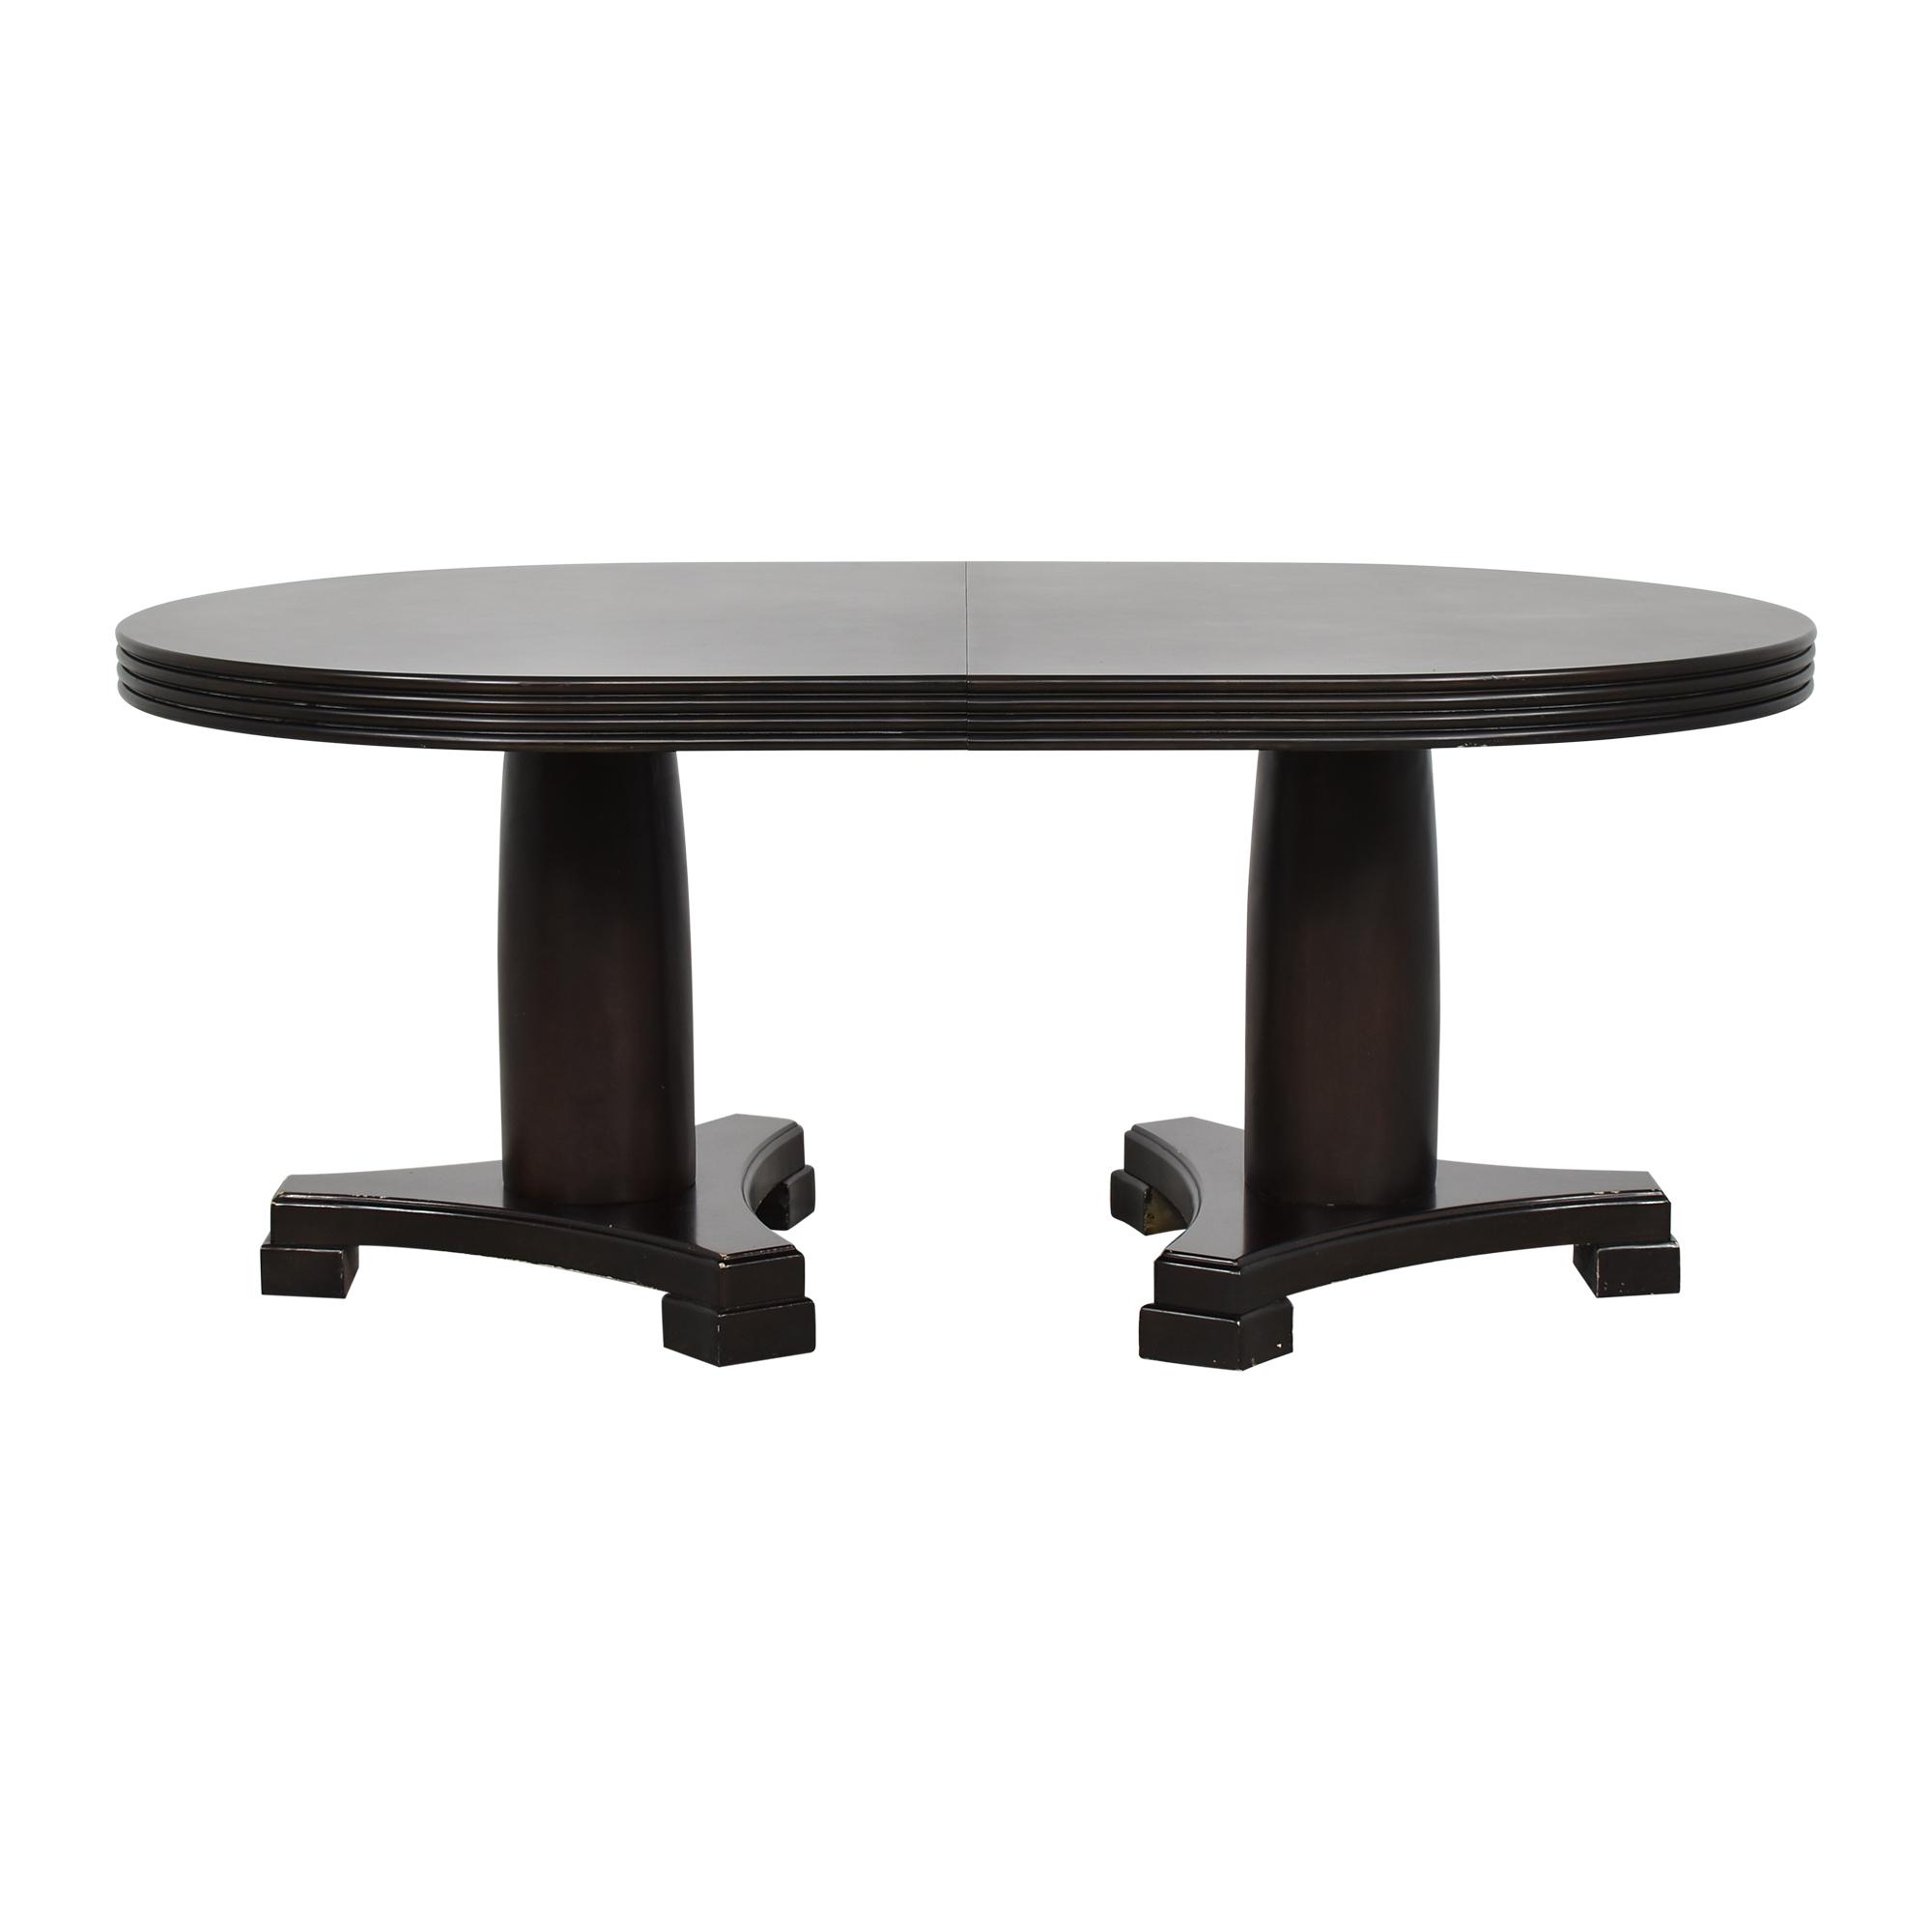 Double Pedestal Extendable Dining Table Black